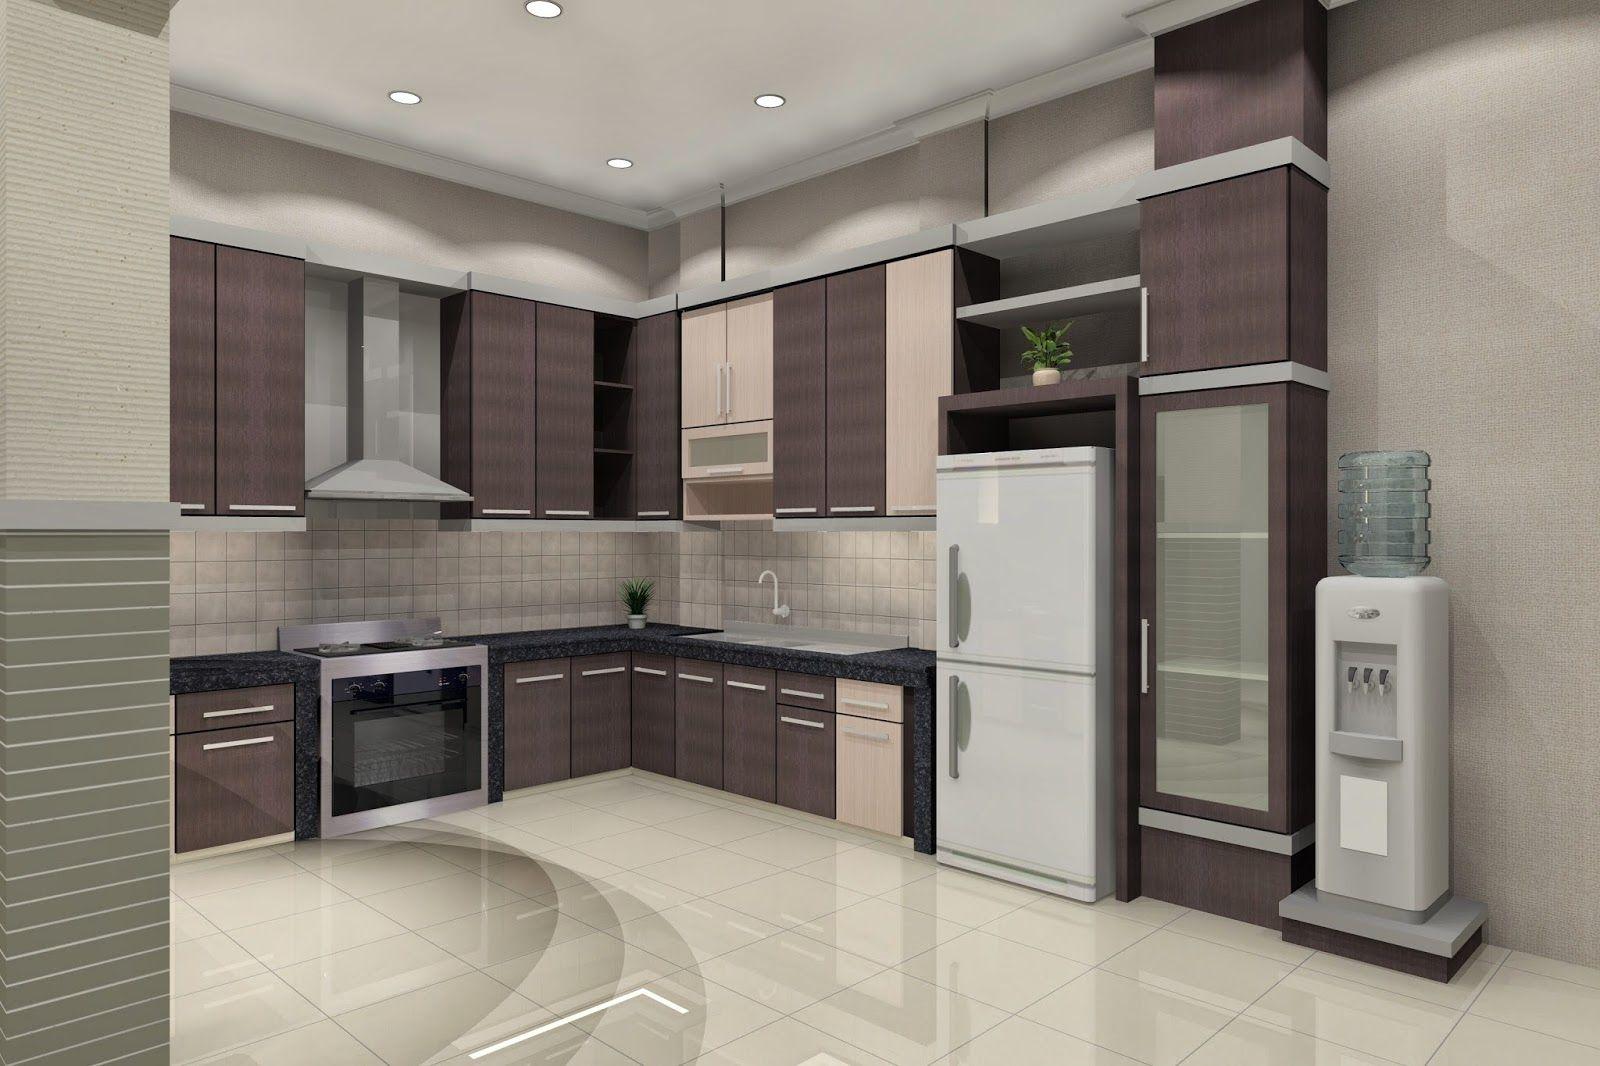 Kitchen set minimalis 2016 - Kitchen Set Kitchen Set Murah Kitchen Set Minimalis Kitchen Set Minimalis Modern